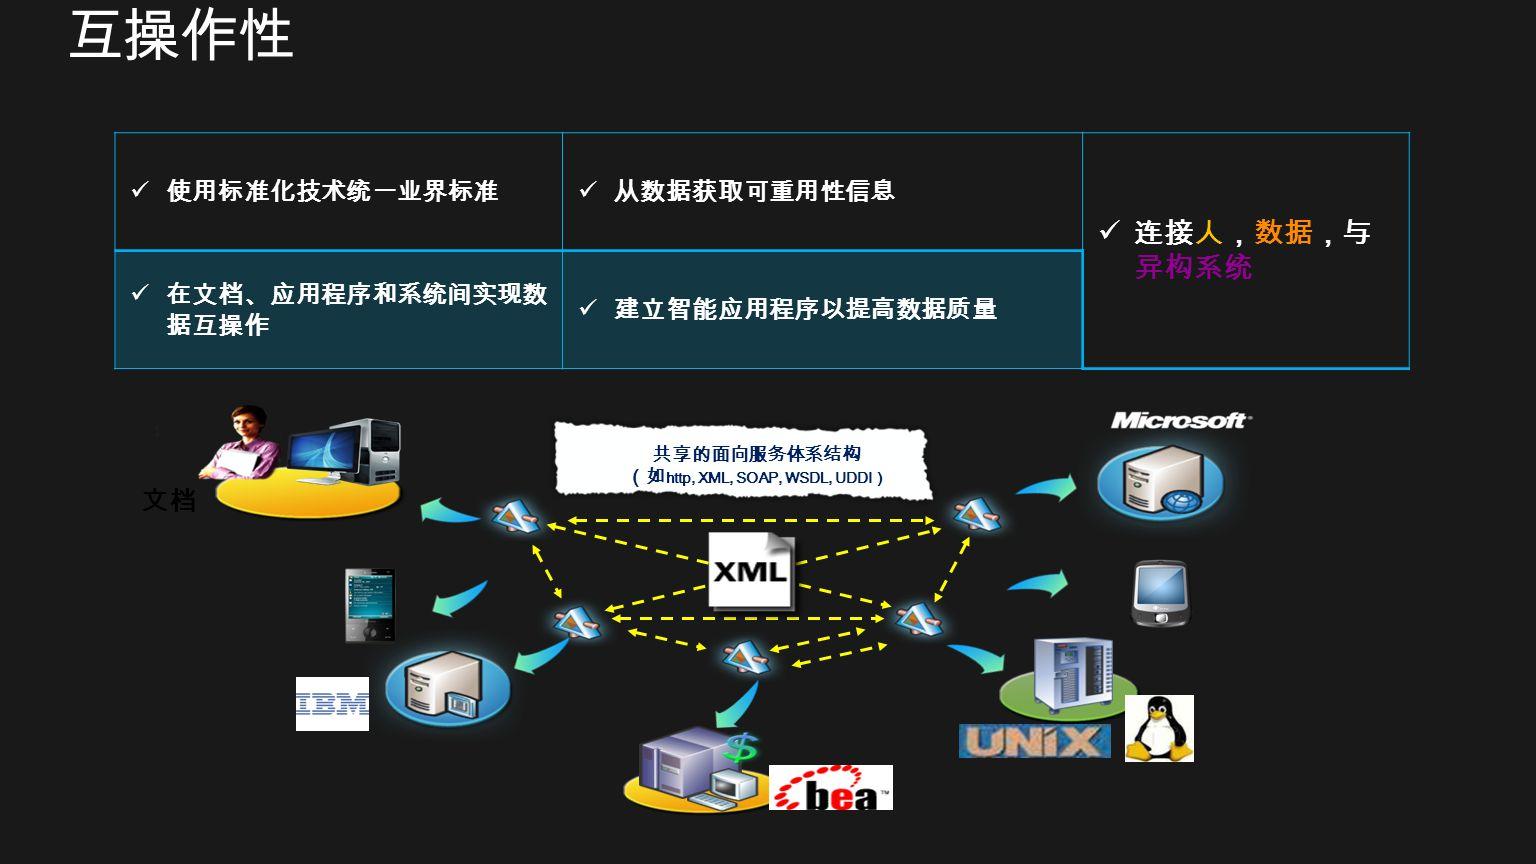 http, XML, SOAP, WSDL, UDDI